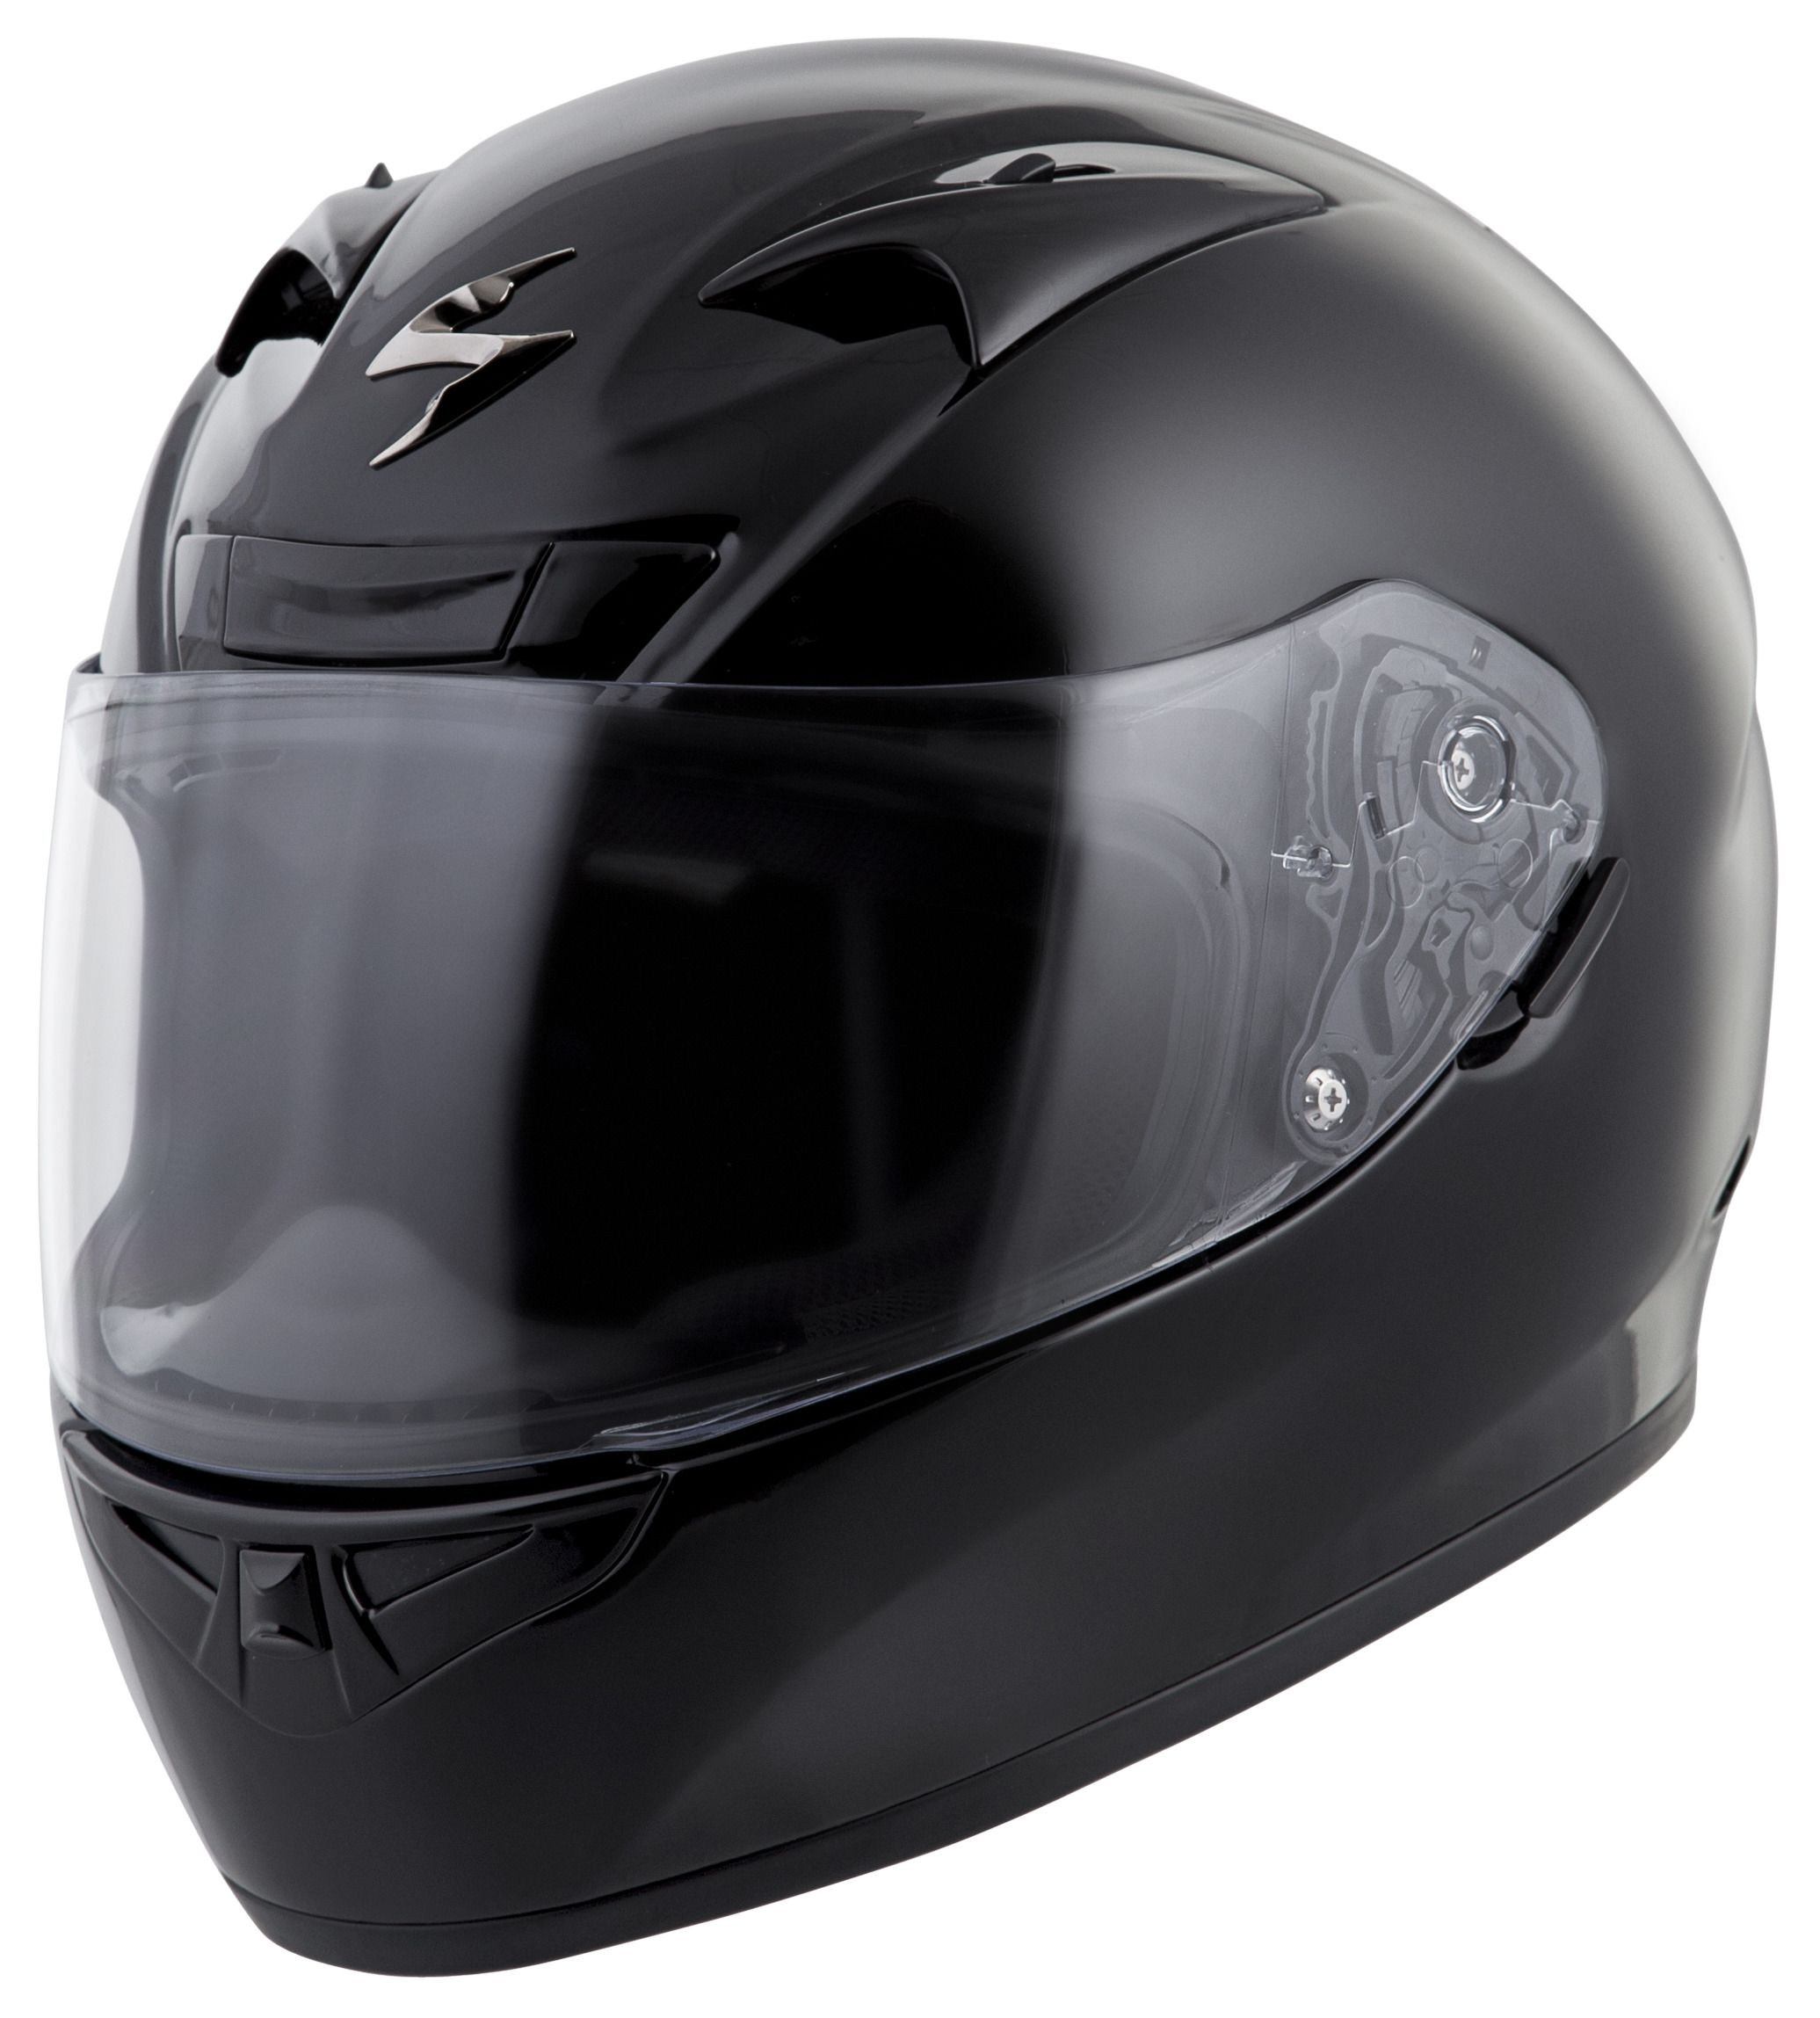 Scorpion Exo R710 Helmet Solid Revzilla Helm Glossy Racing Spirit White Blue